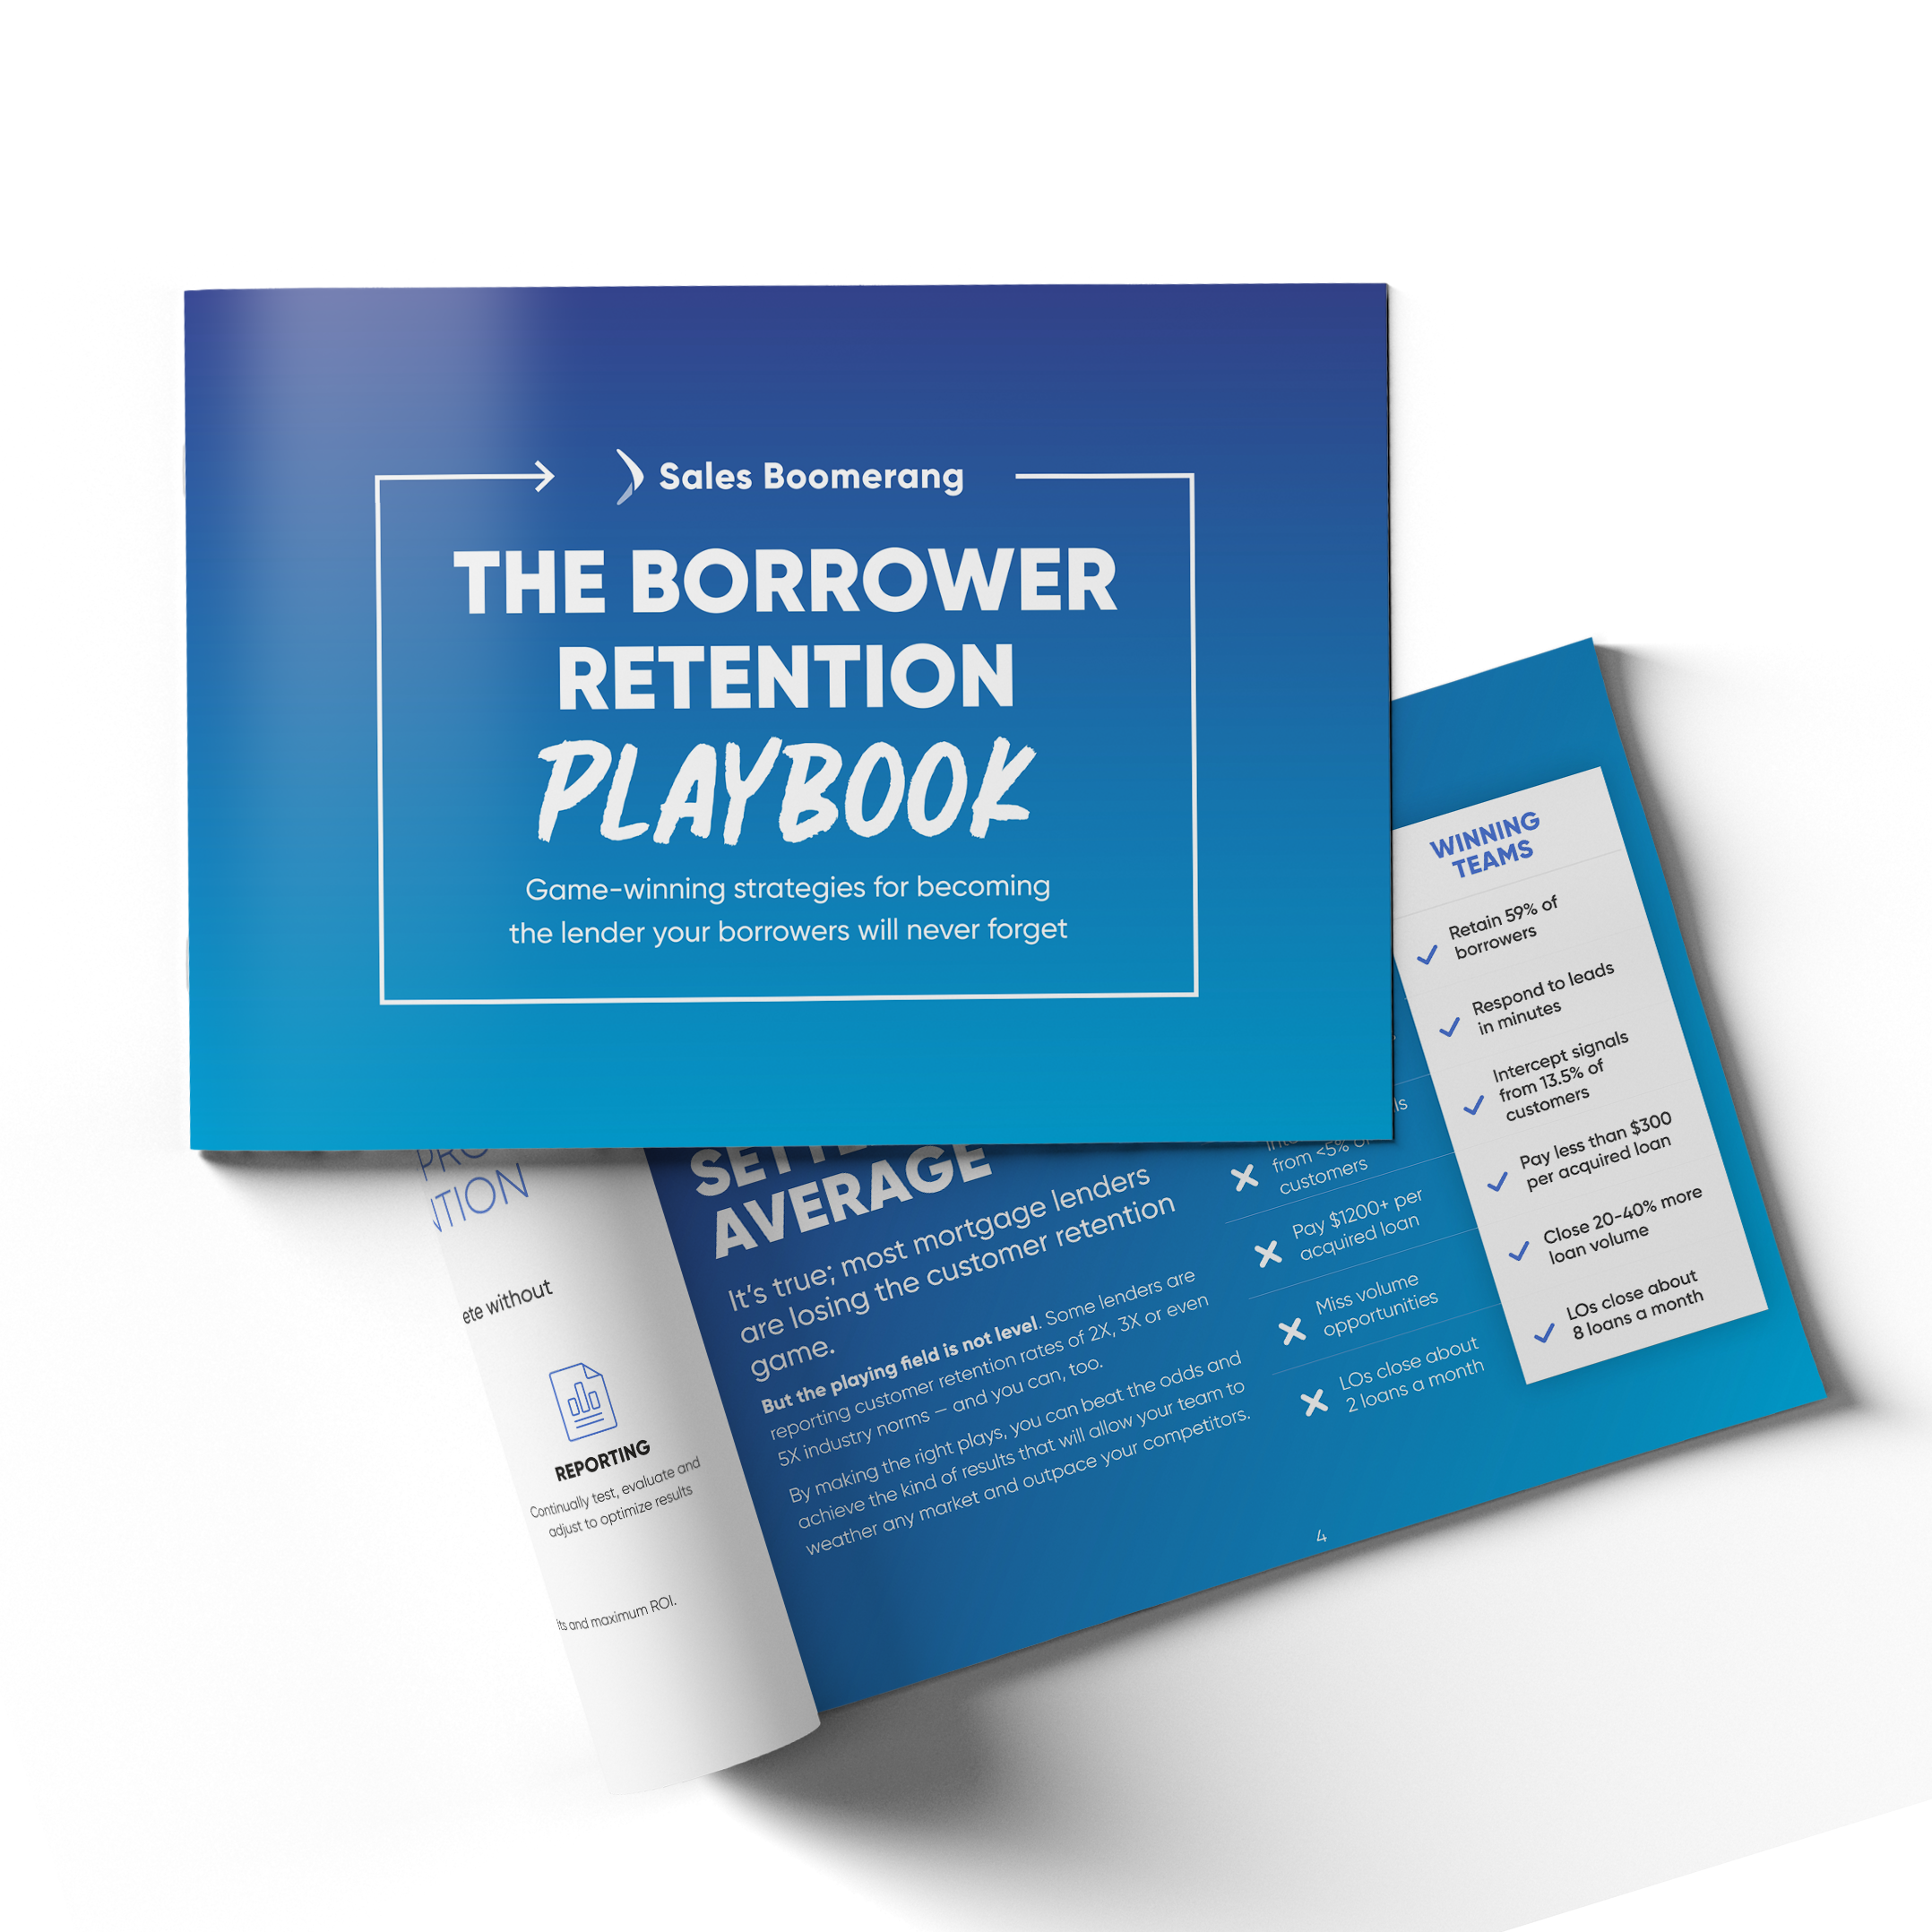 The Borrower Retention Playbook_Thumbanail